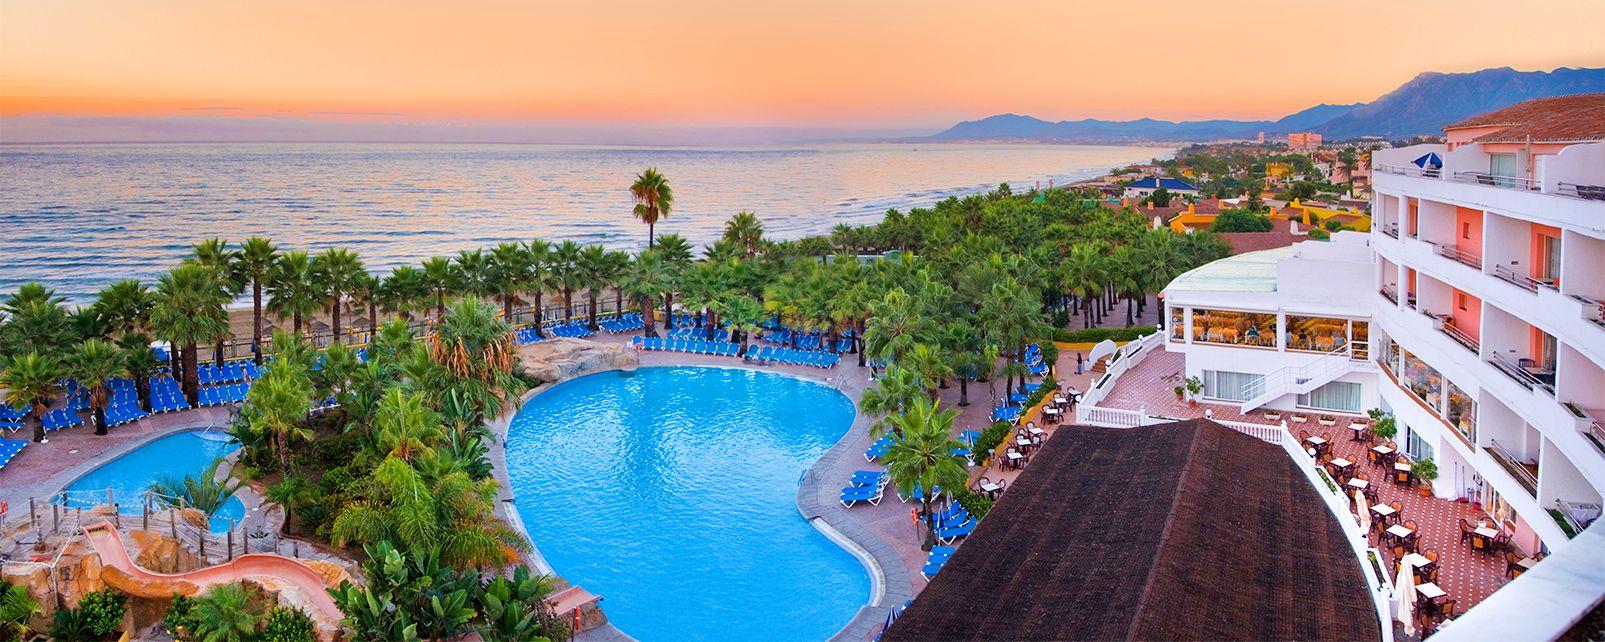 Hotel Club Lookéa Marbella Playa,